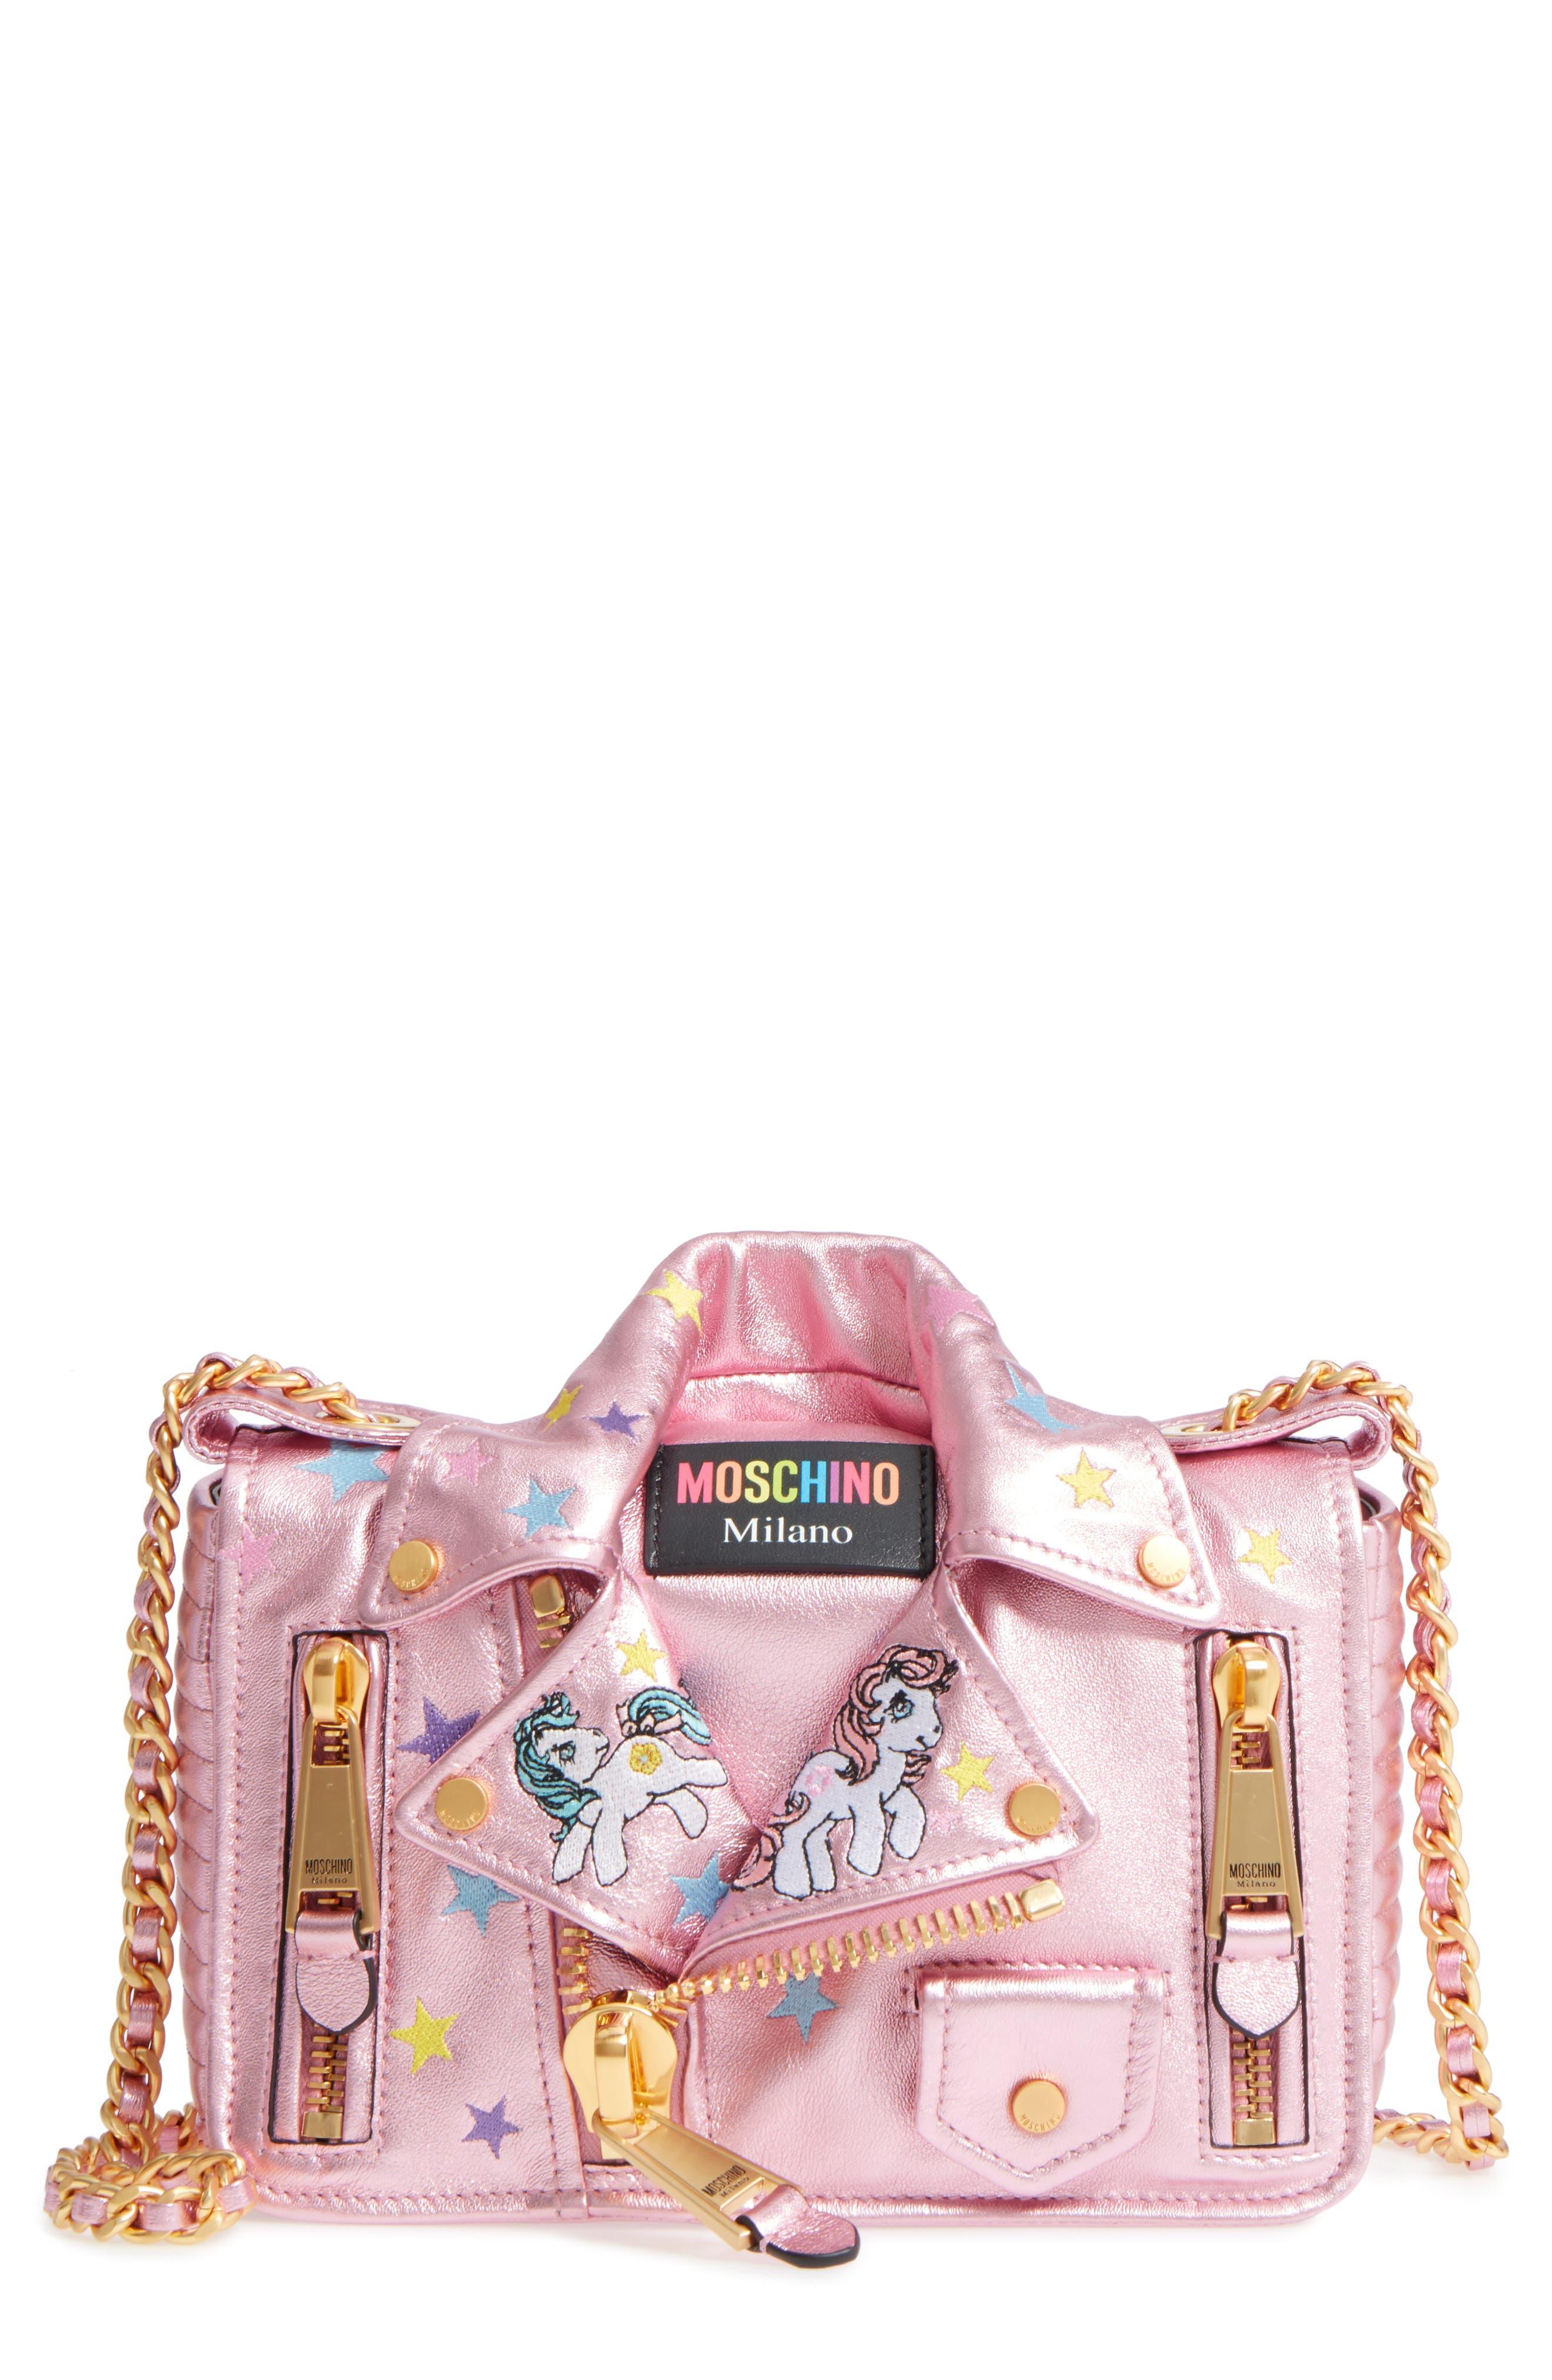 x My Little Pony Biker Jacket Metallic Leather Crossbody Bag,                             Main thumbnail 1, color,                             661